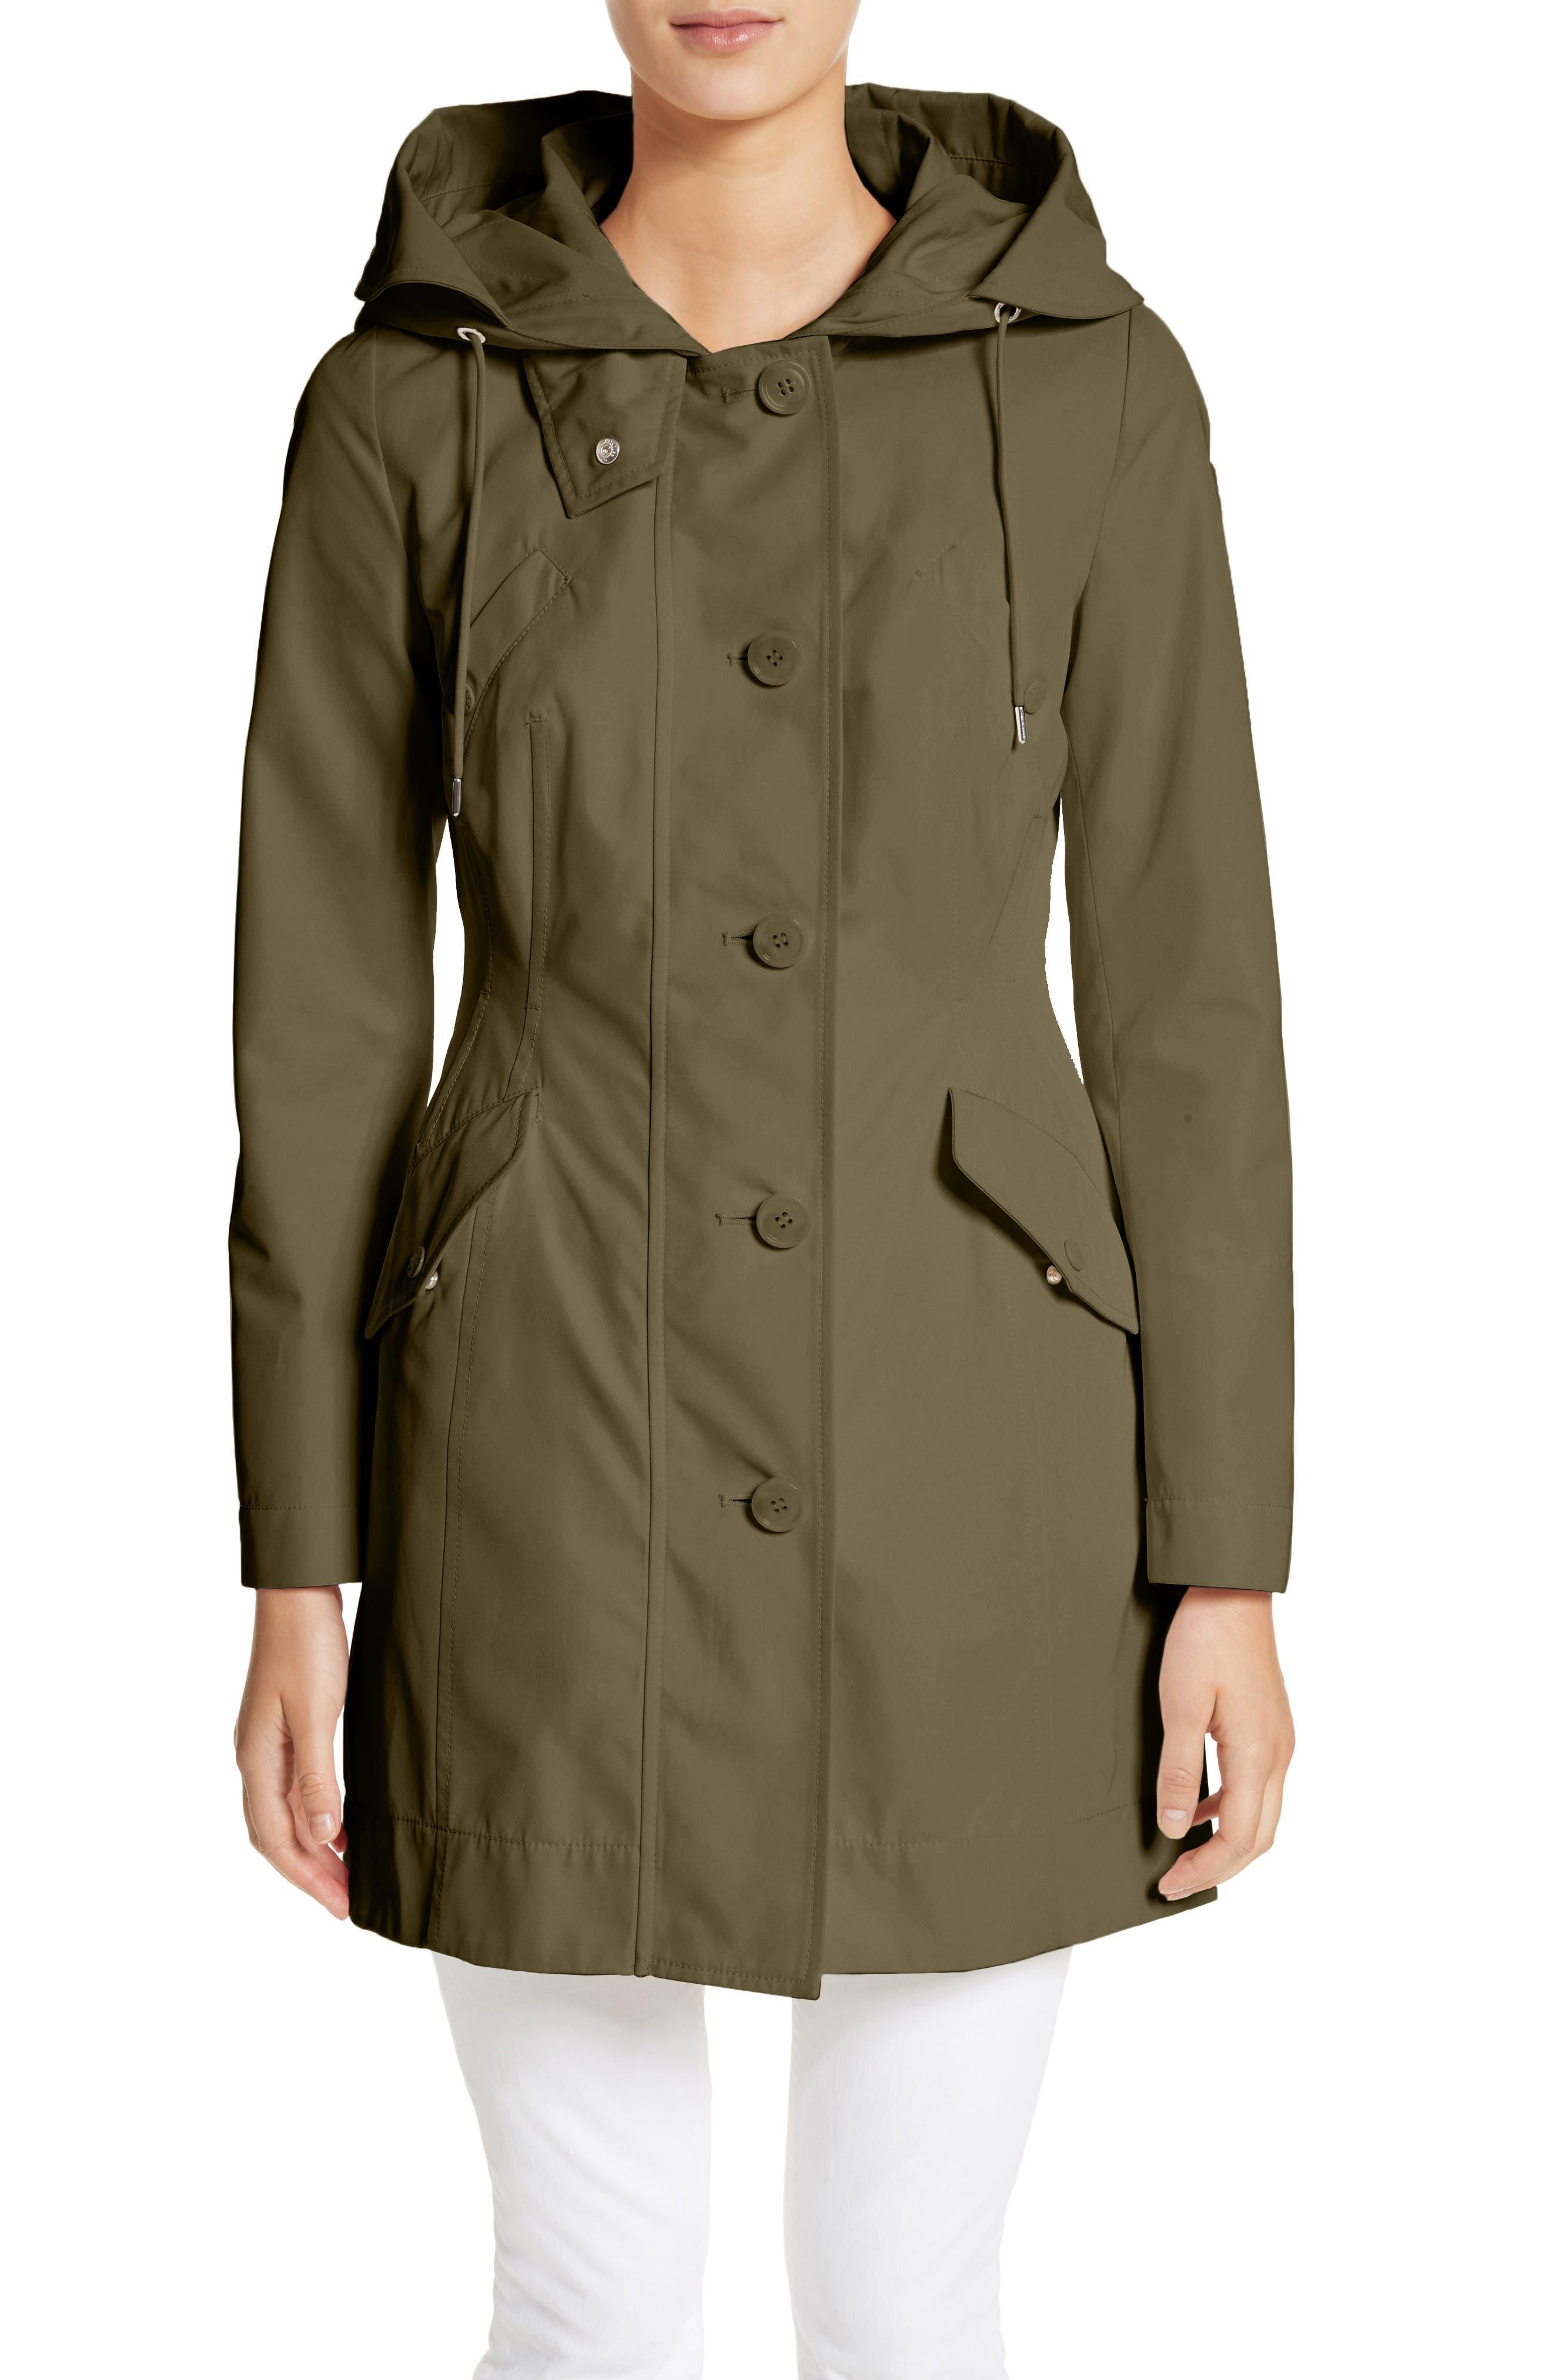 Moncler Audrey Water Resistant Hooded Raincoat